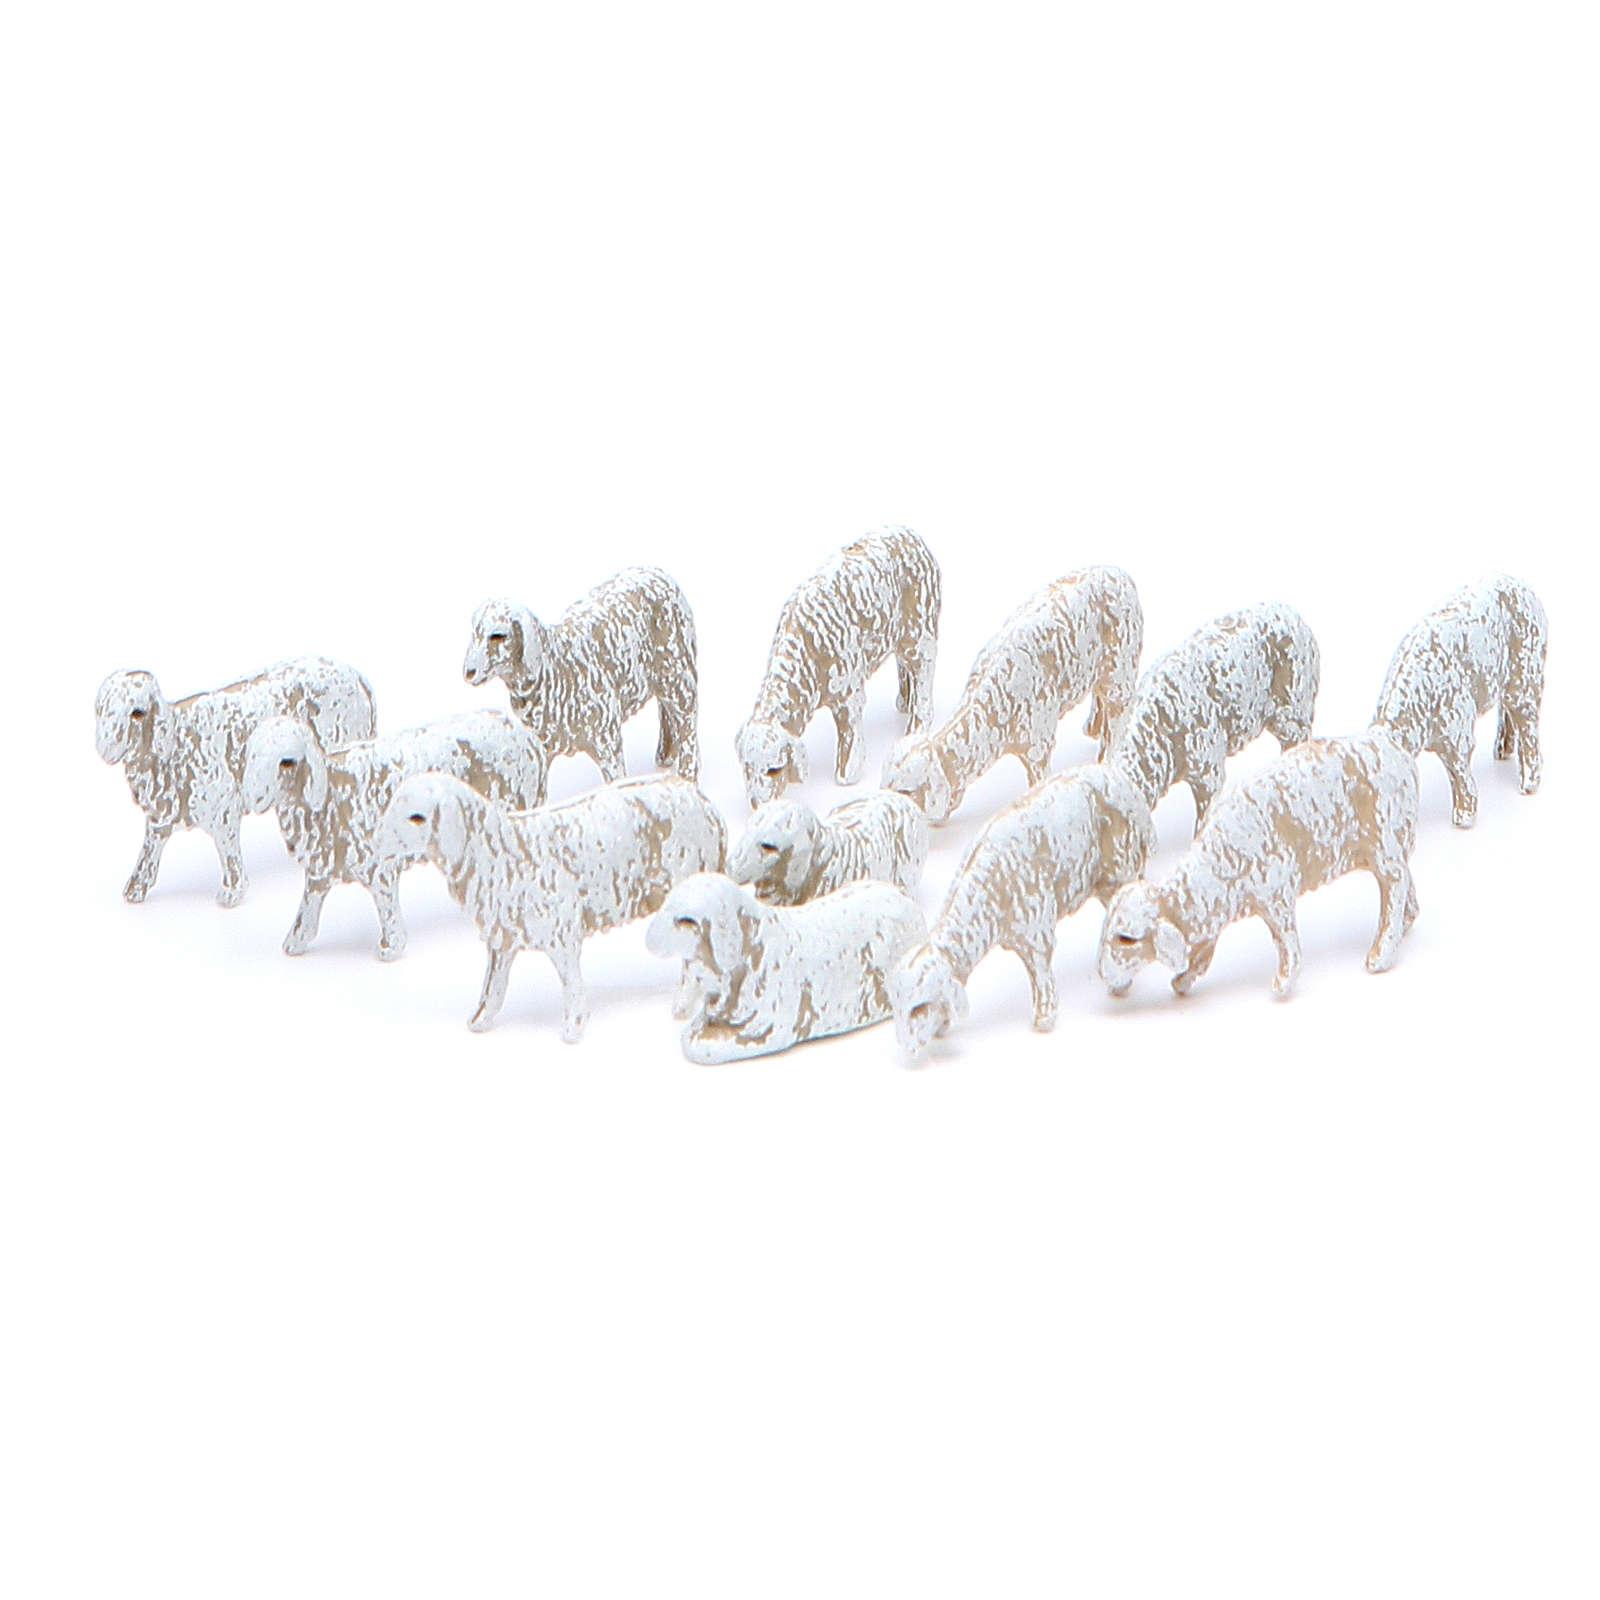 Pecorelle 6 cm Moranduzzo set 12 pezzi 4